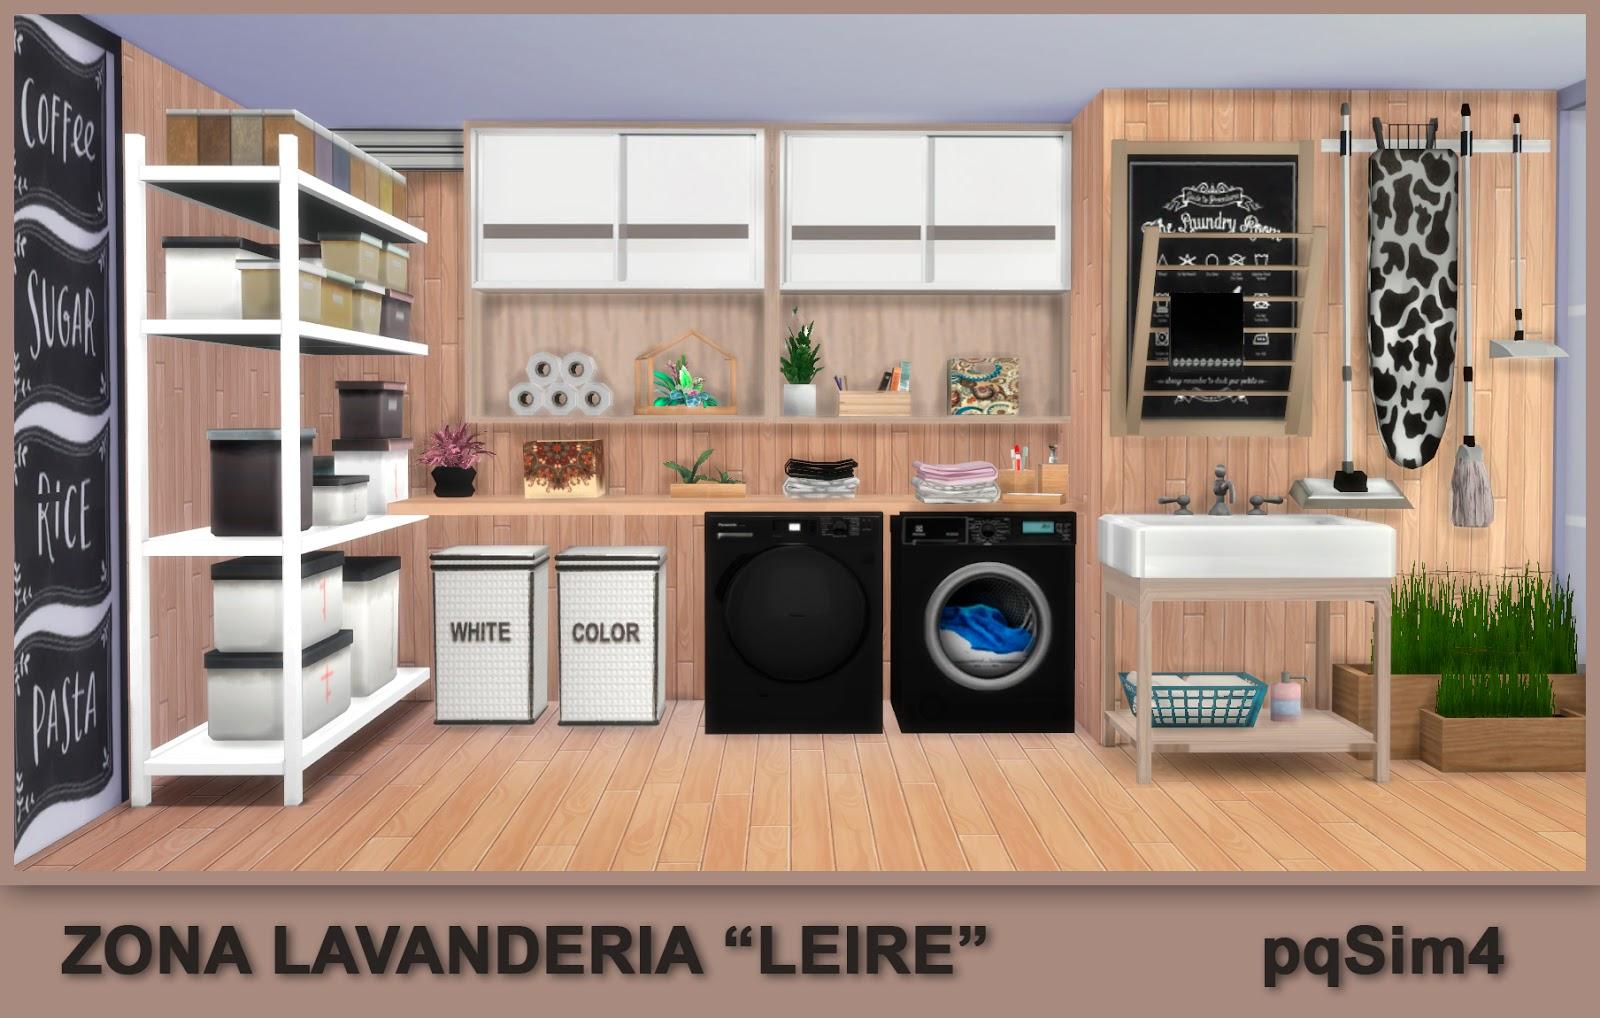 Zona lavander a leire sims 4 custom content - Zona lavanderia ...